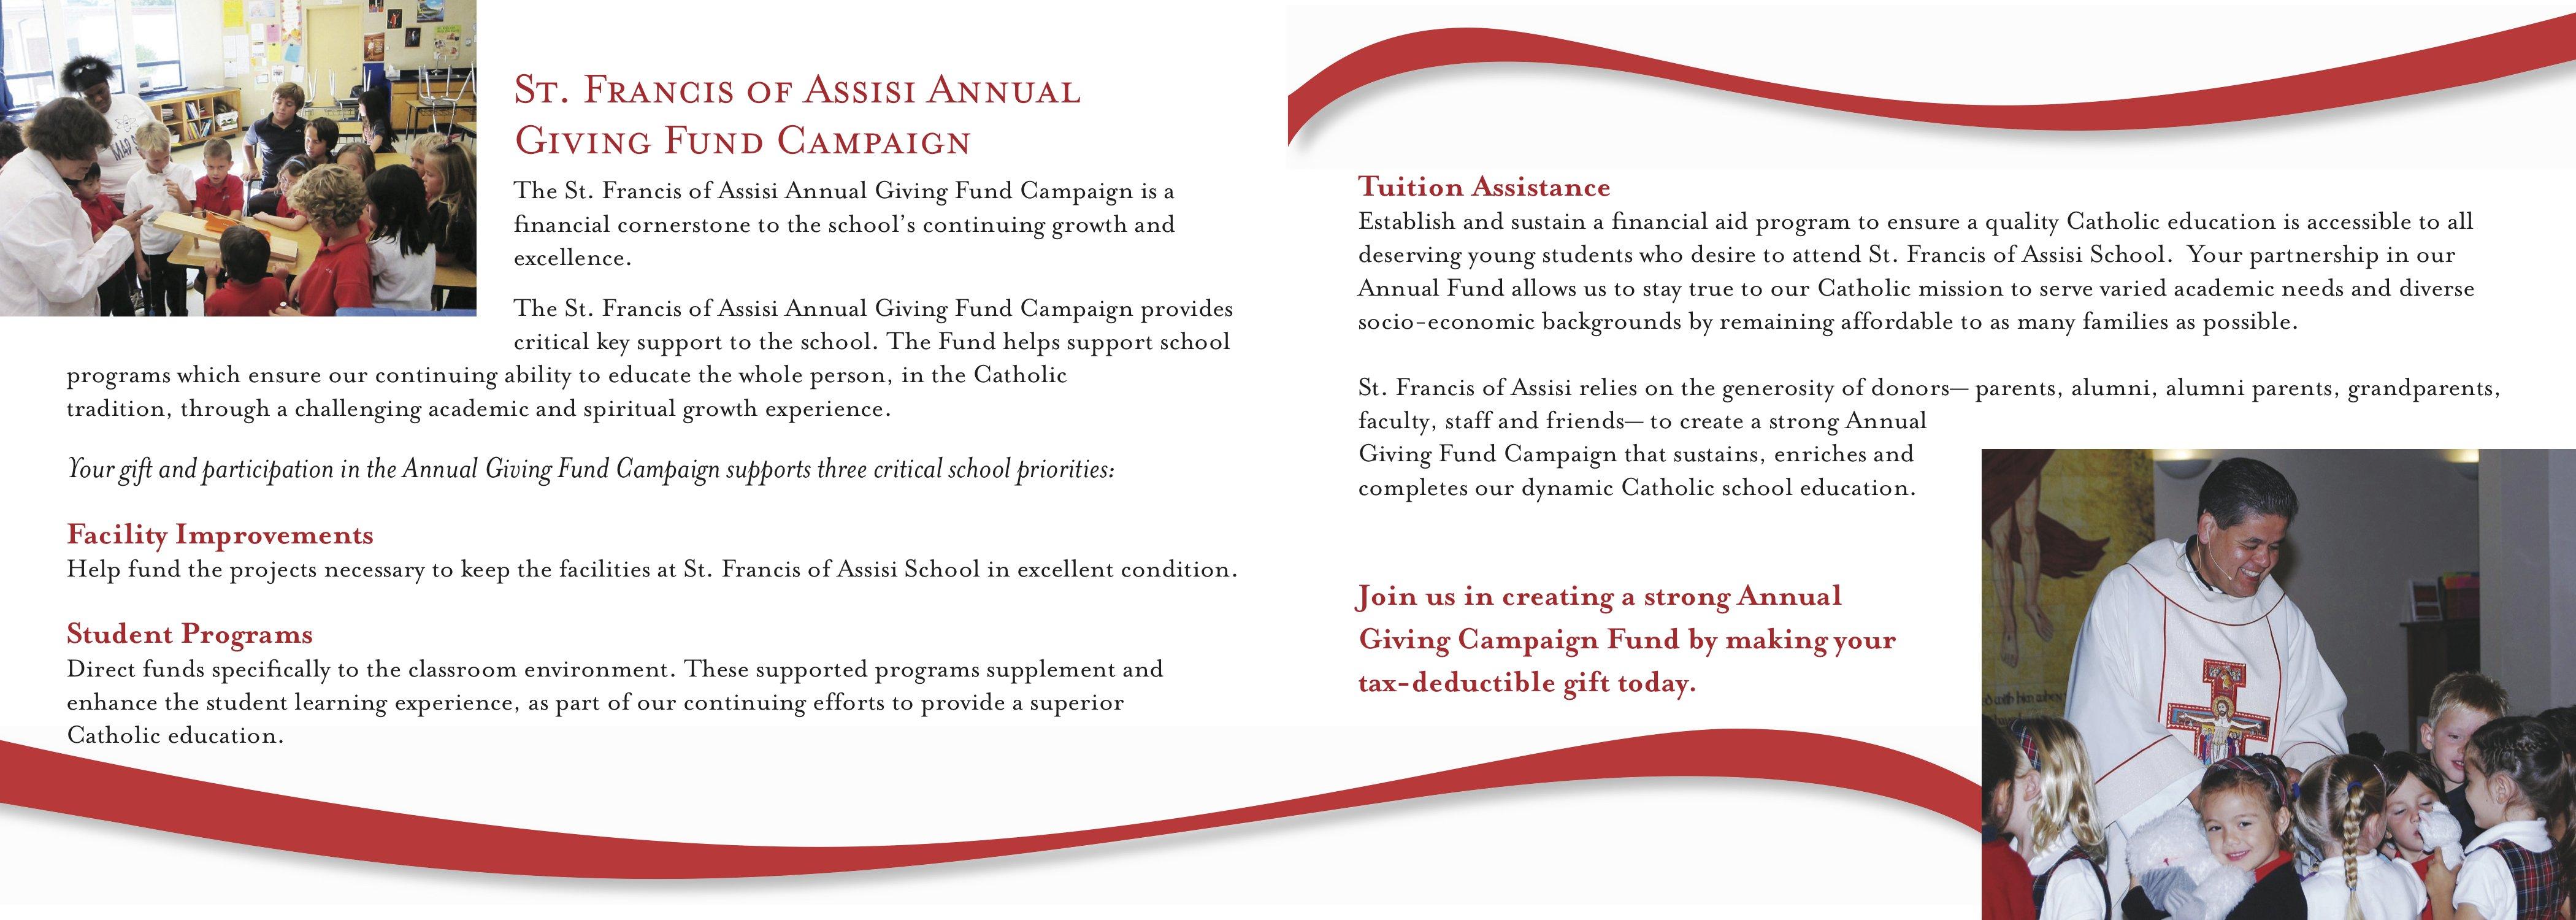 SFA Annual Fund Final 2013